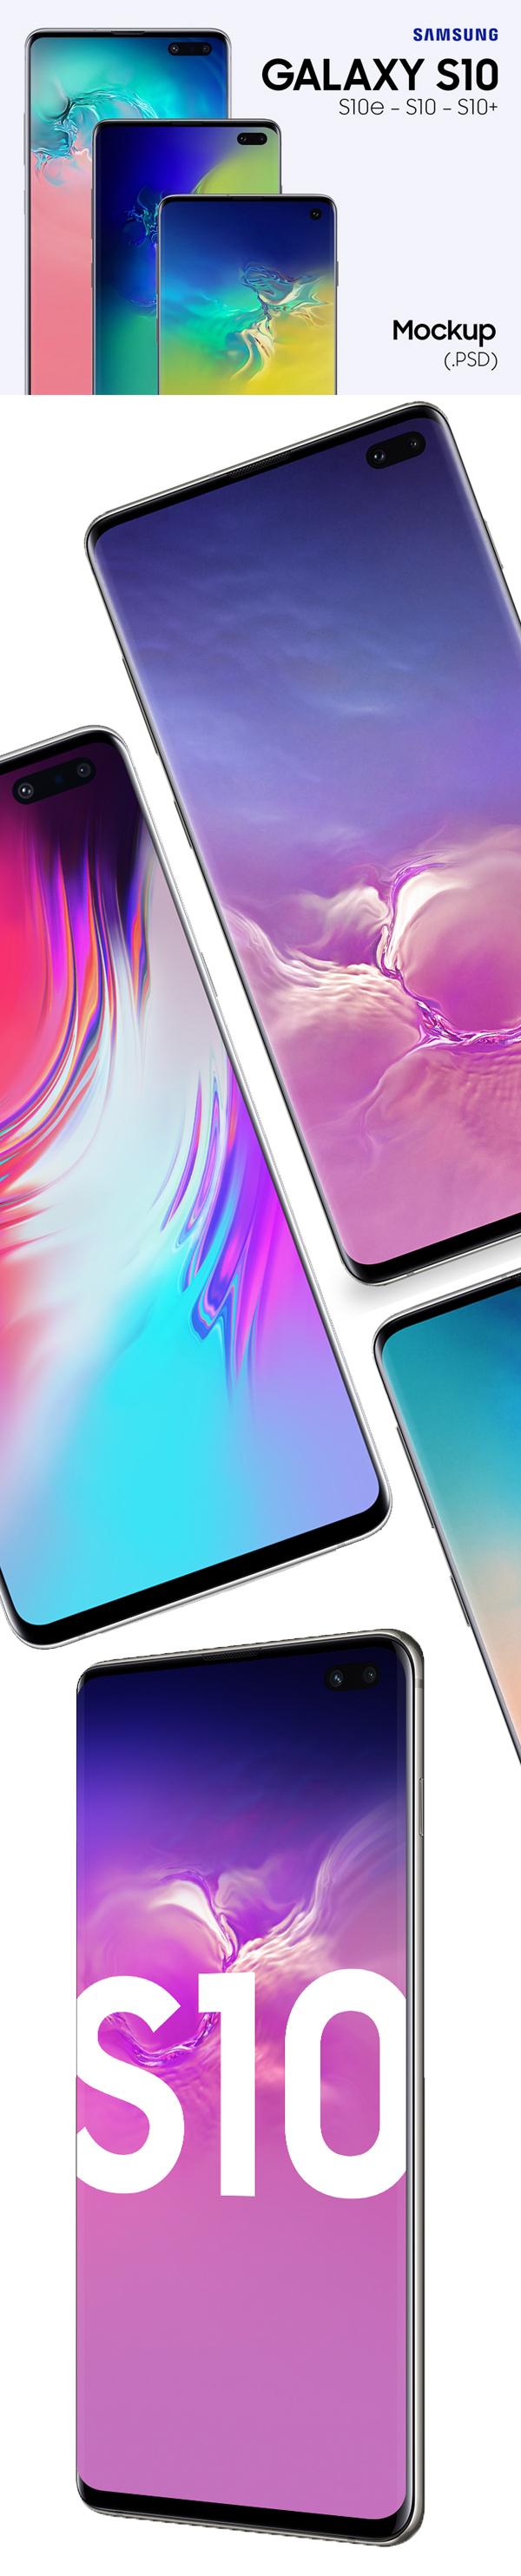 Free Samsung Galaxy S10e S10 S10 Mockups